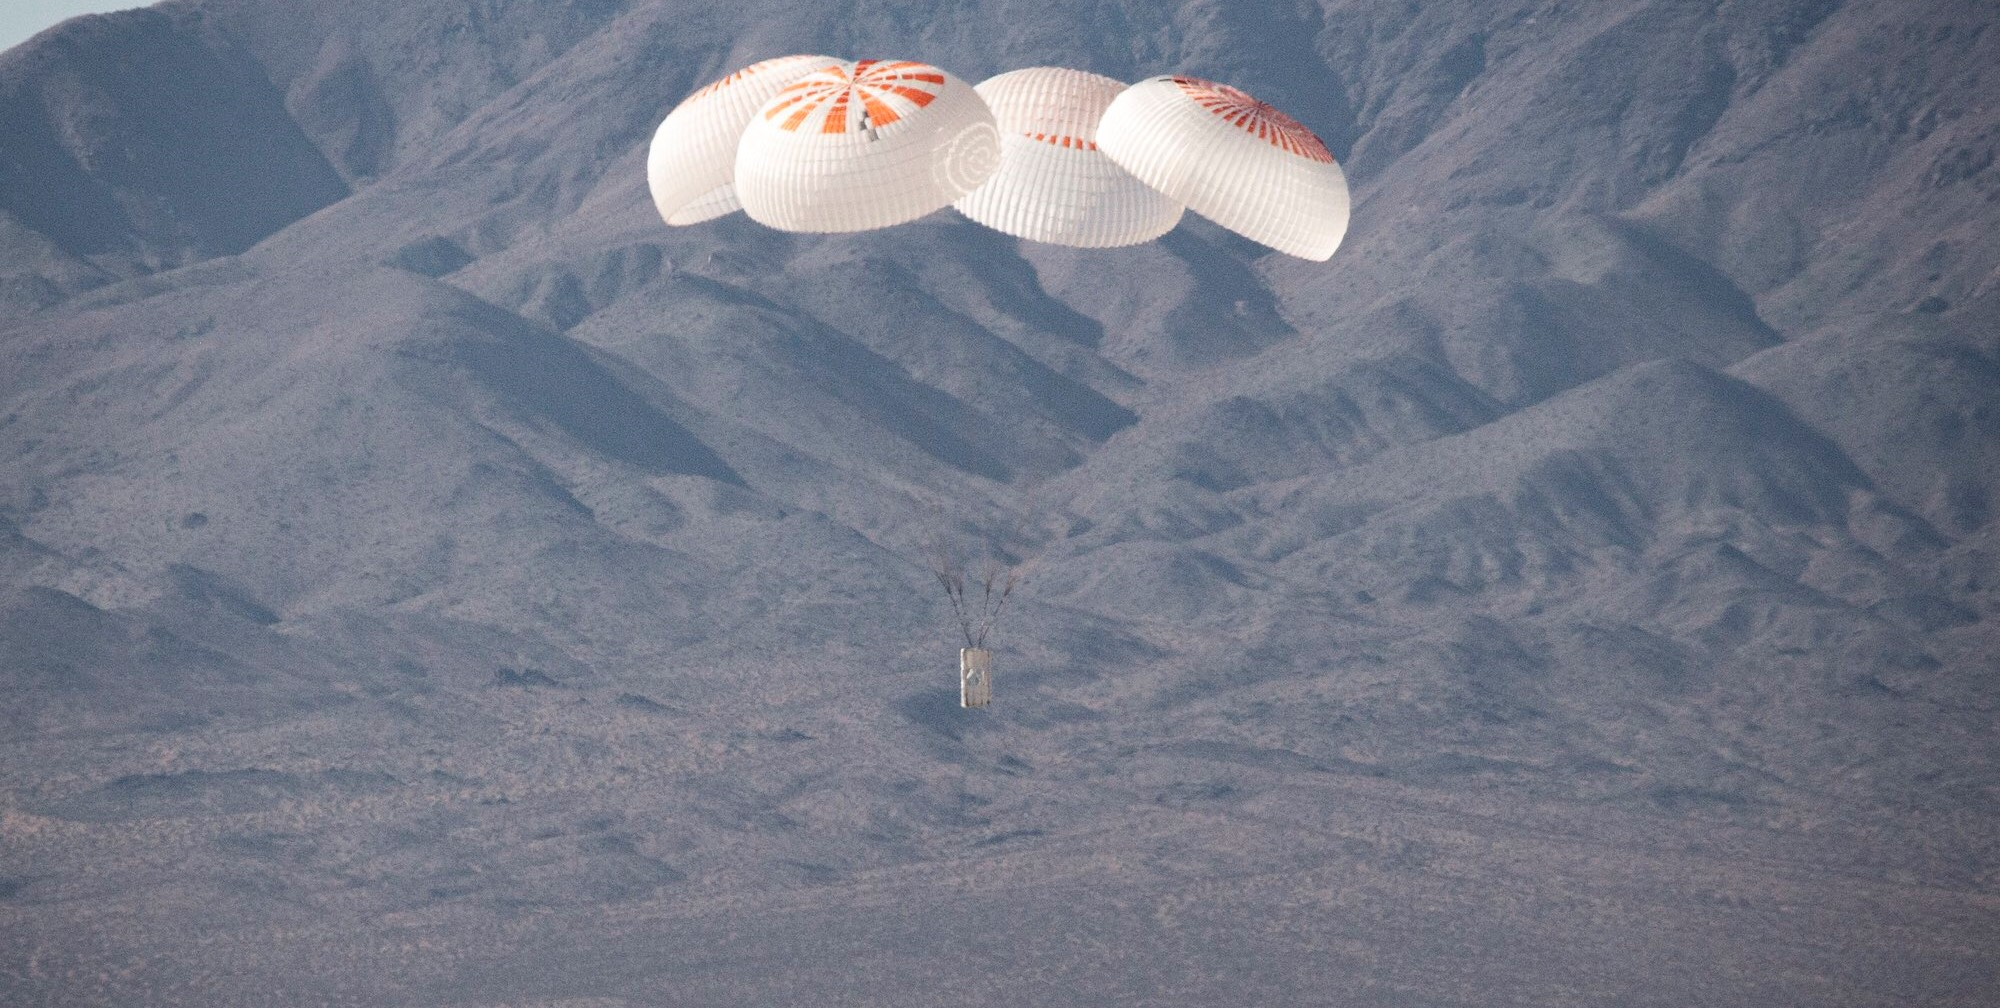 Crew Dragon Mk3 four parachute testing Nov 2019 (SpaceX) 2 crop